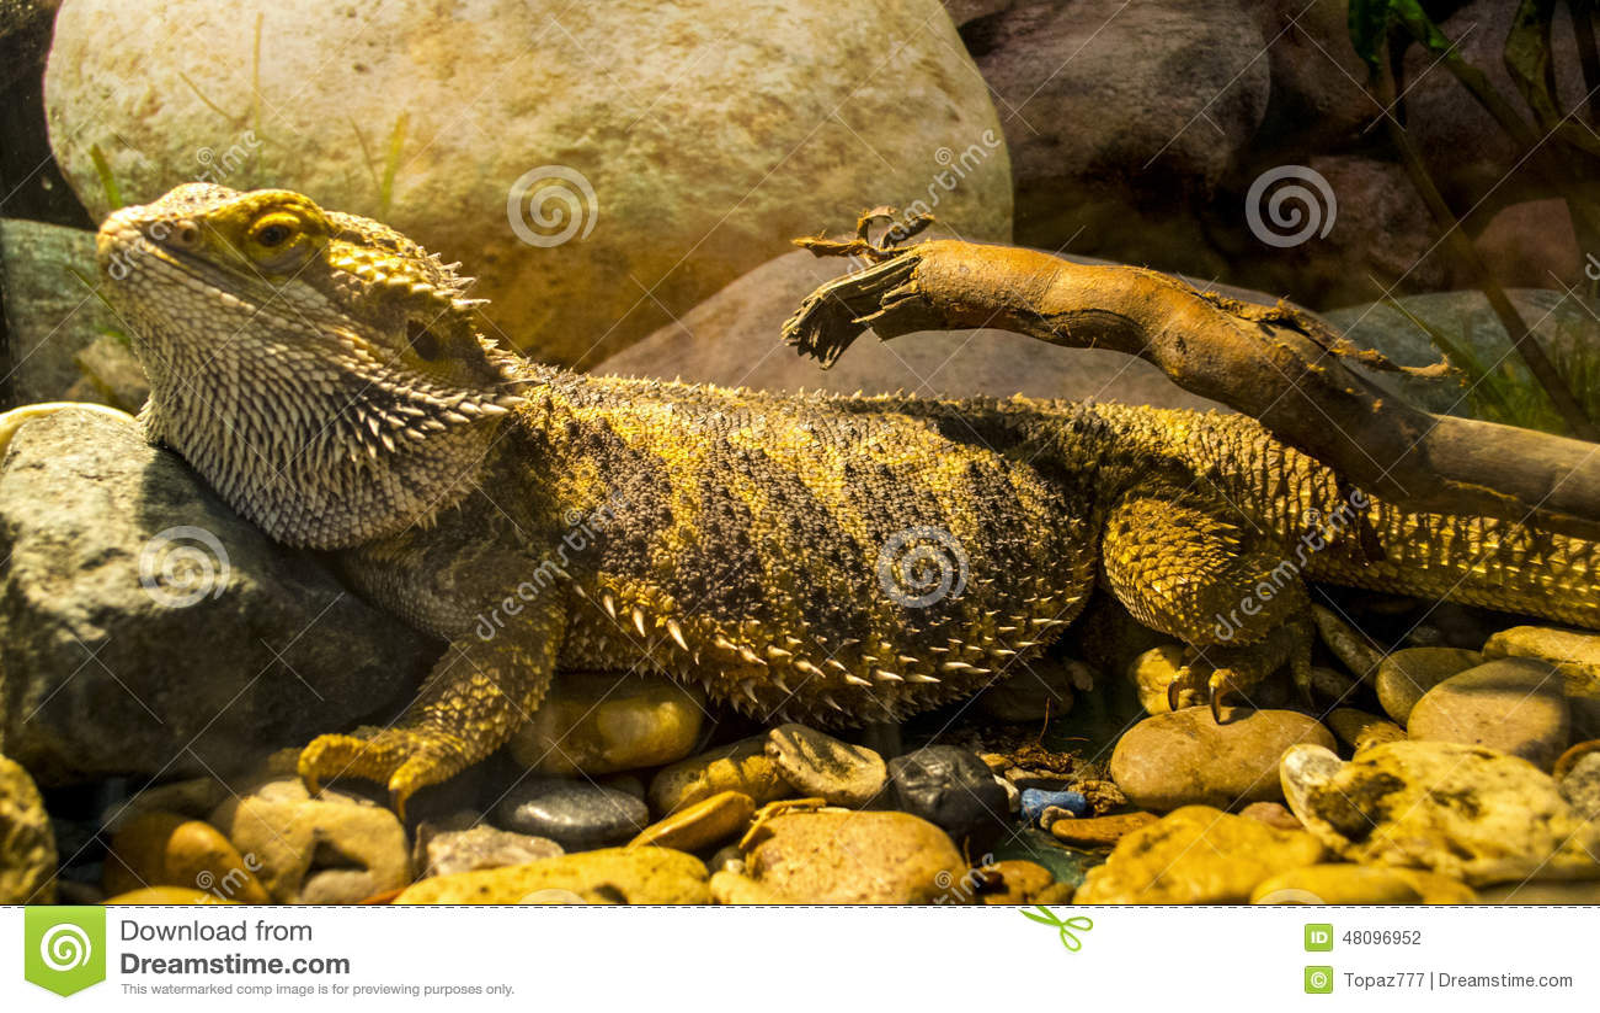 Armadillo Lizard Photos Free Royalty Free Stock Photos From Dreamstime